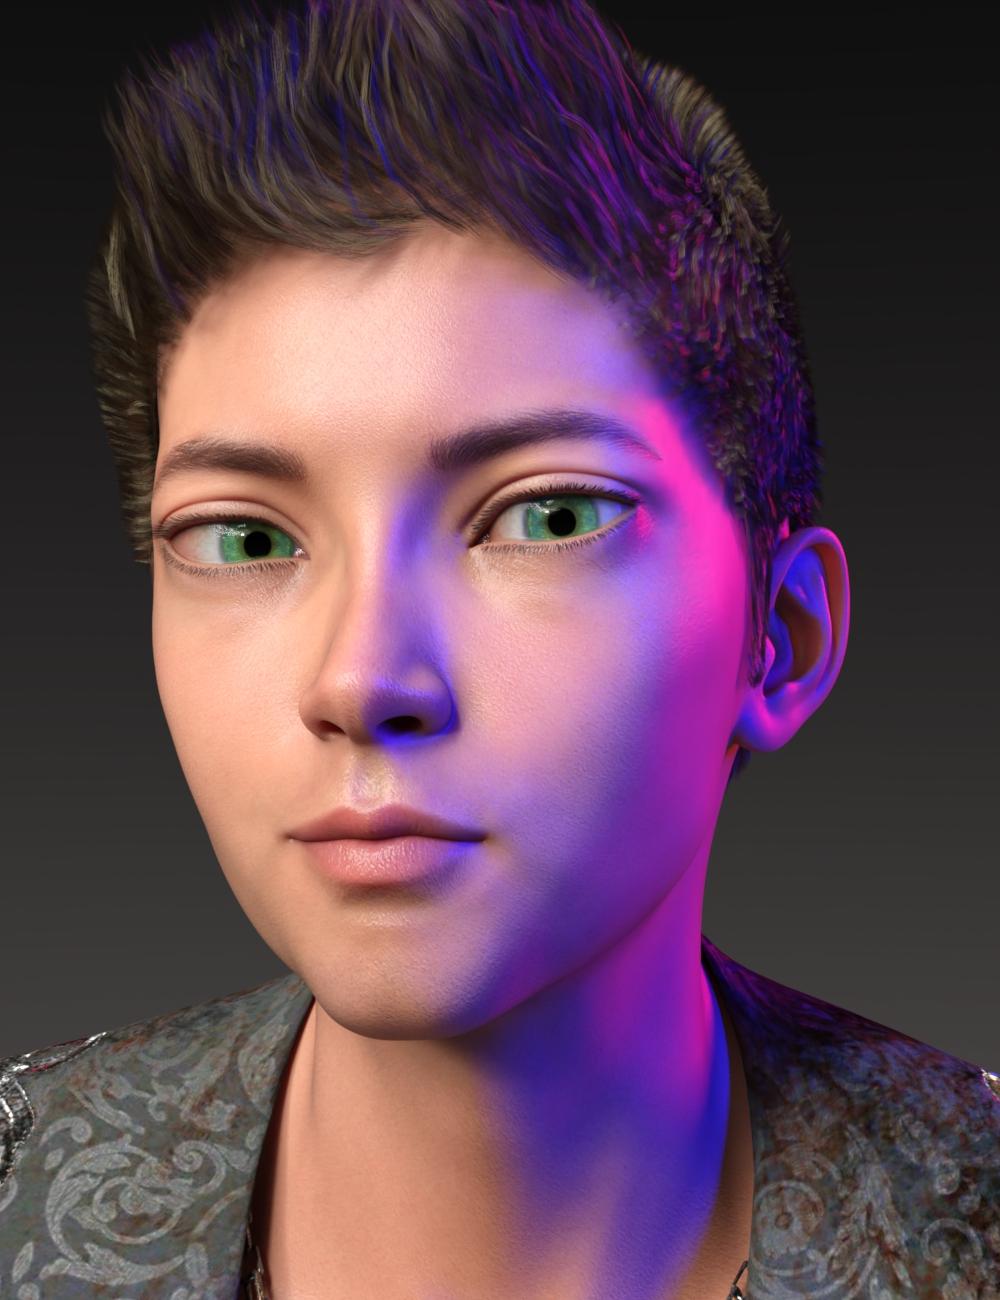 Alternative Shapes for Kota 8.1 by: AliveSheCried, 3D Models by Daz 3D